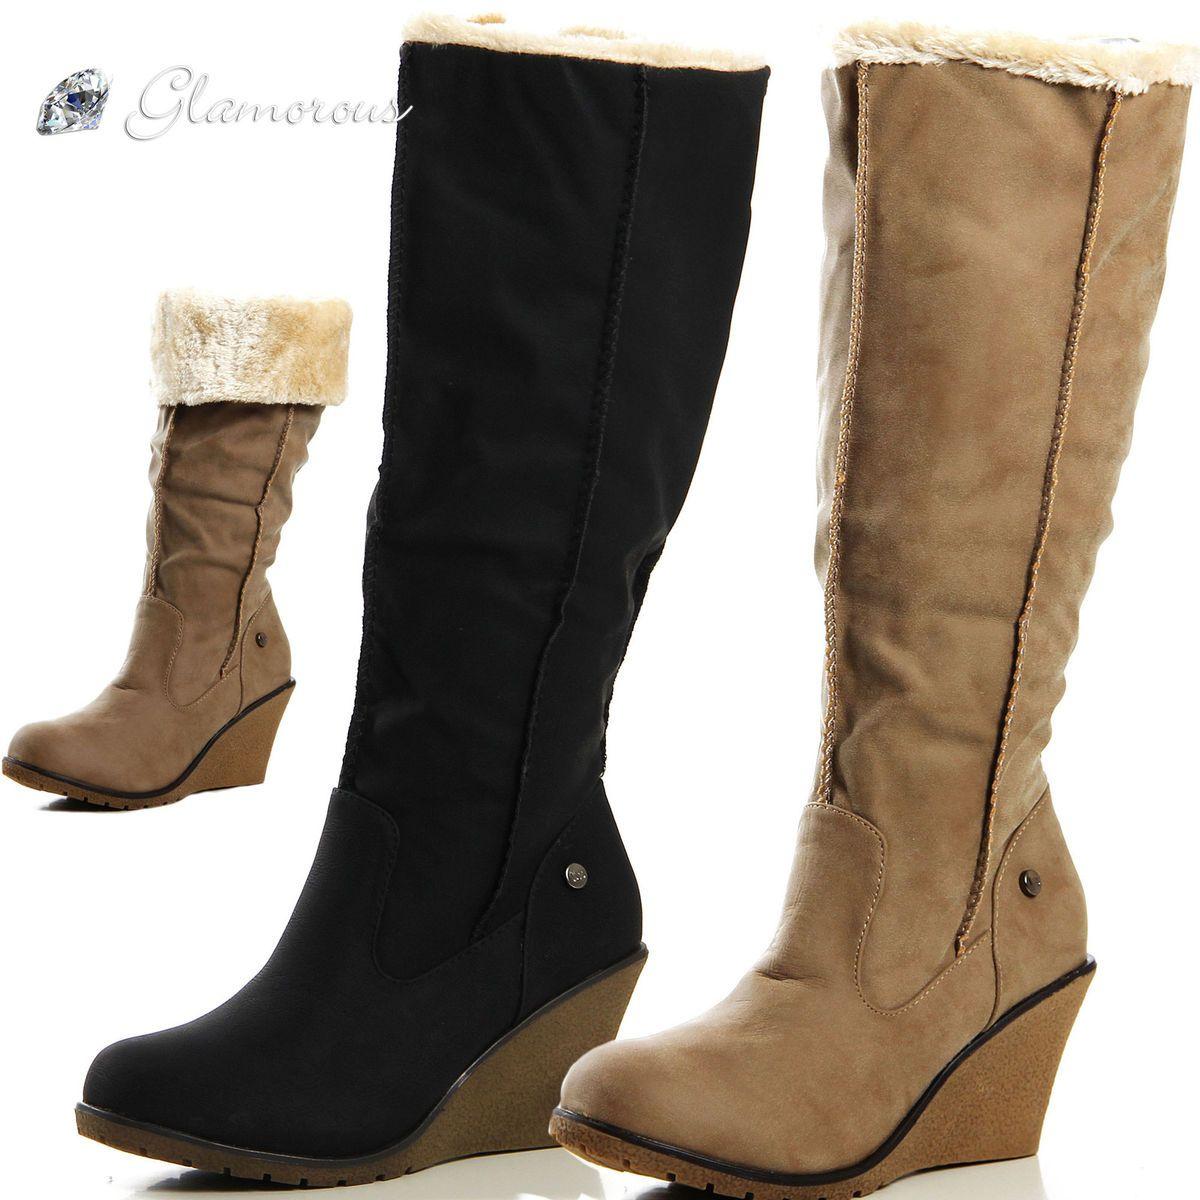 Keil Stiefelette Schuhe Damen Deichmann   Schuhe damen